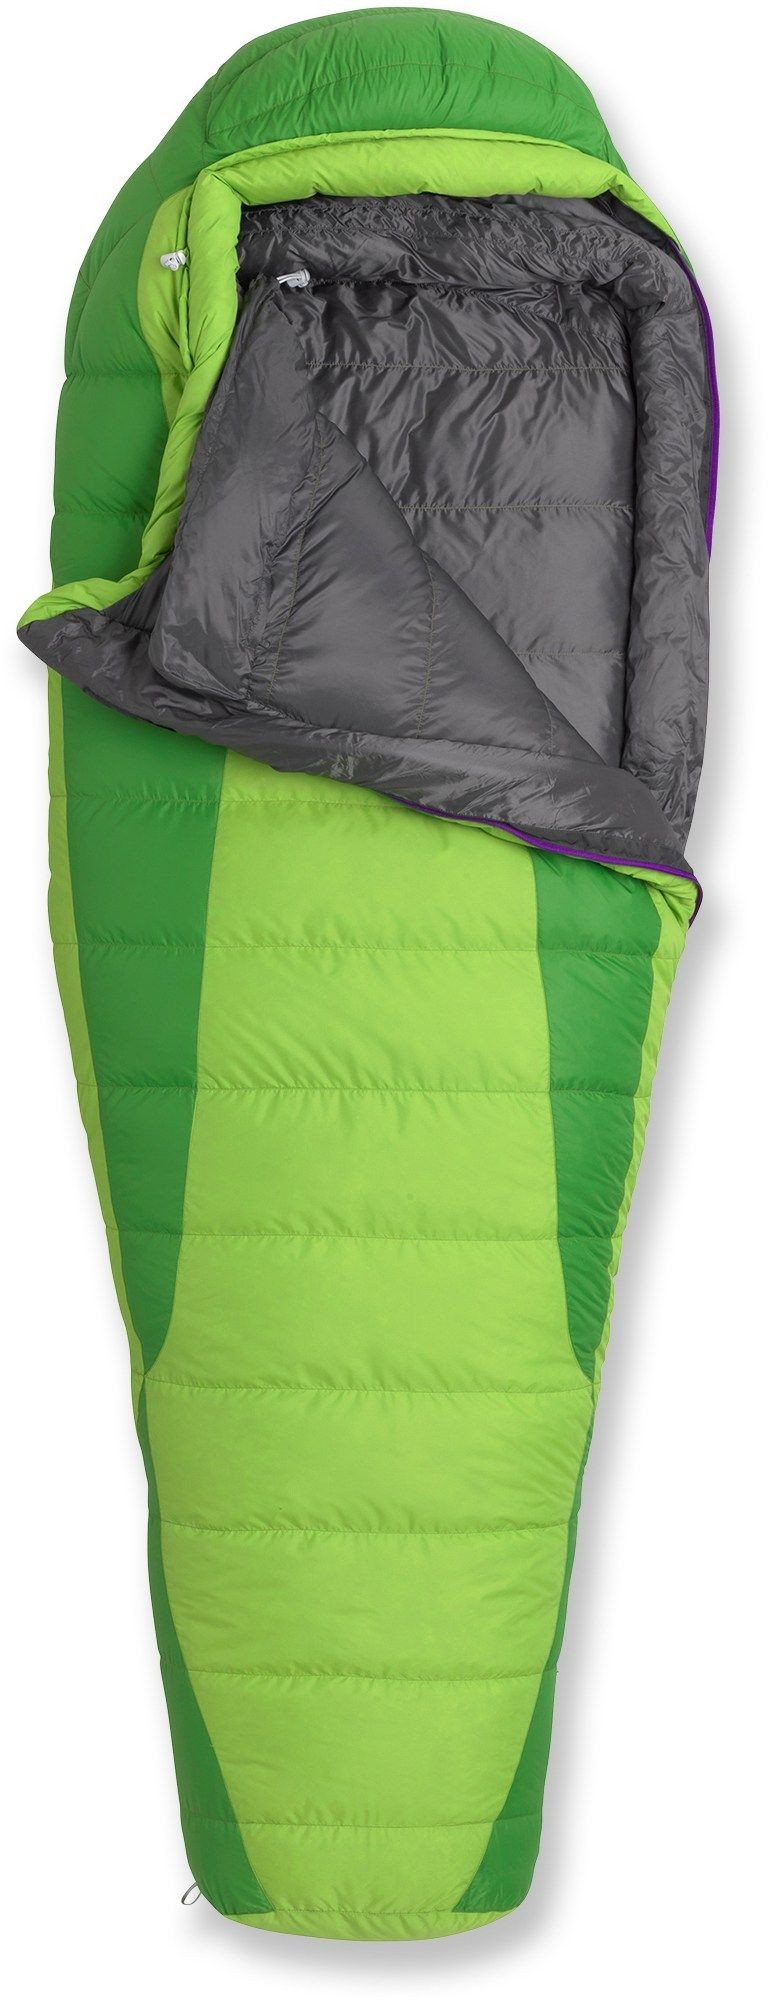 Rei Marmot Sleeping Bag